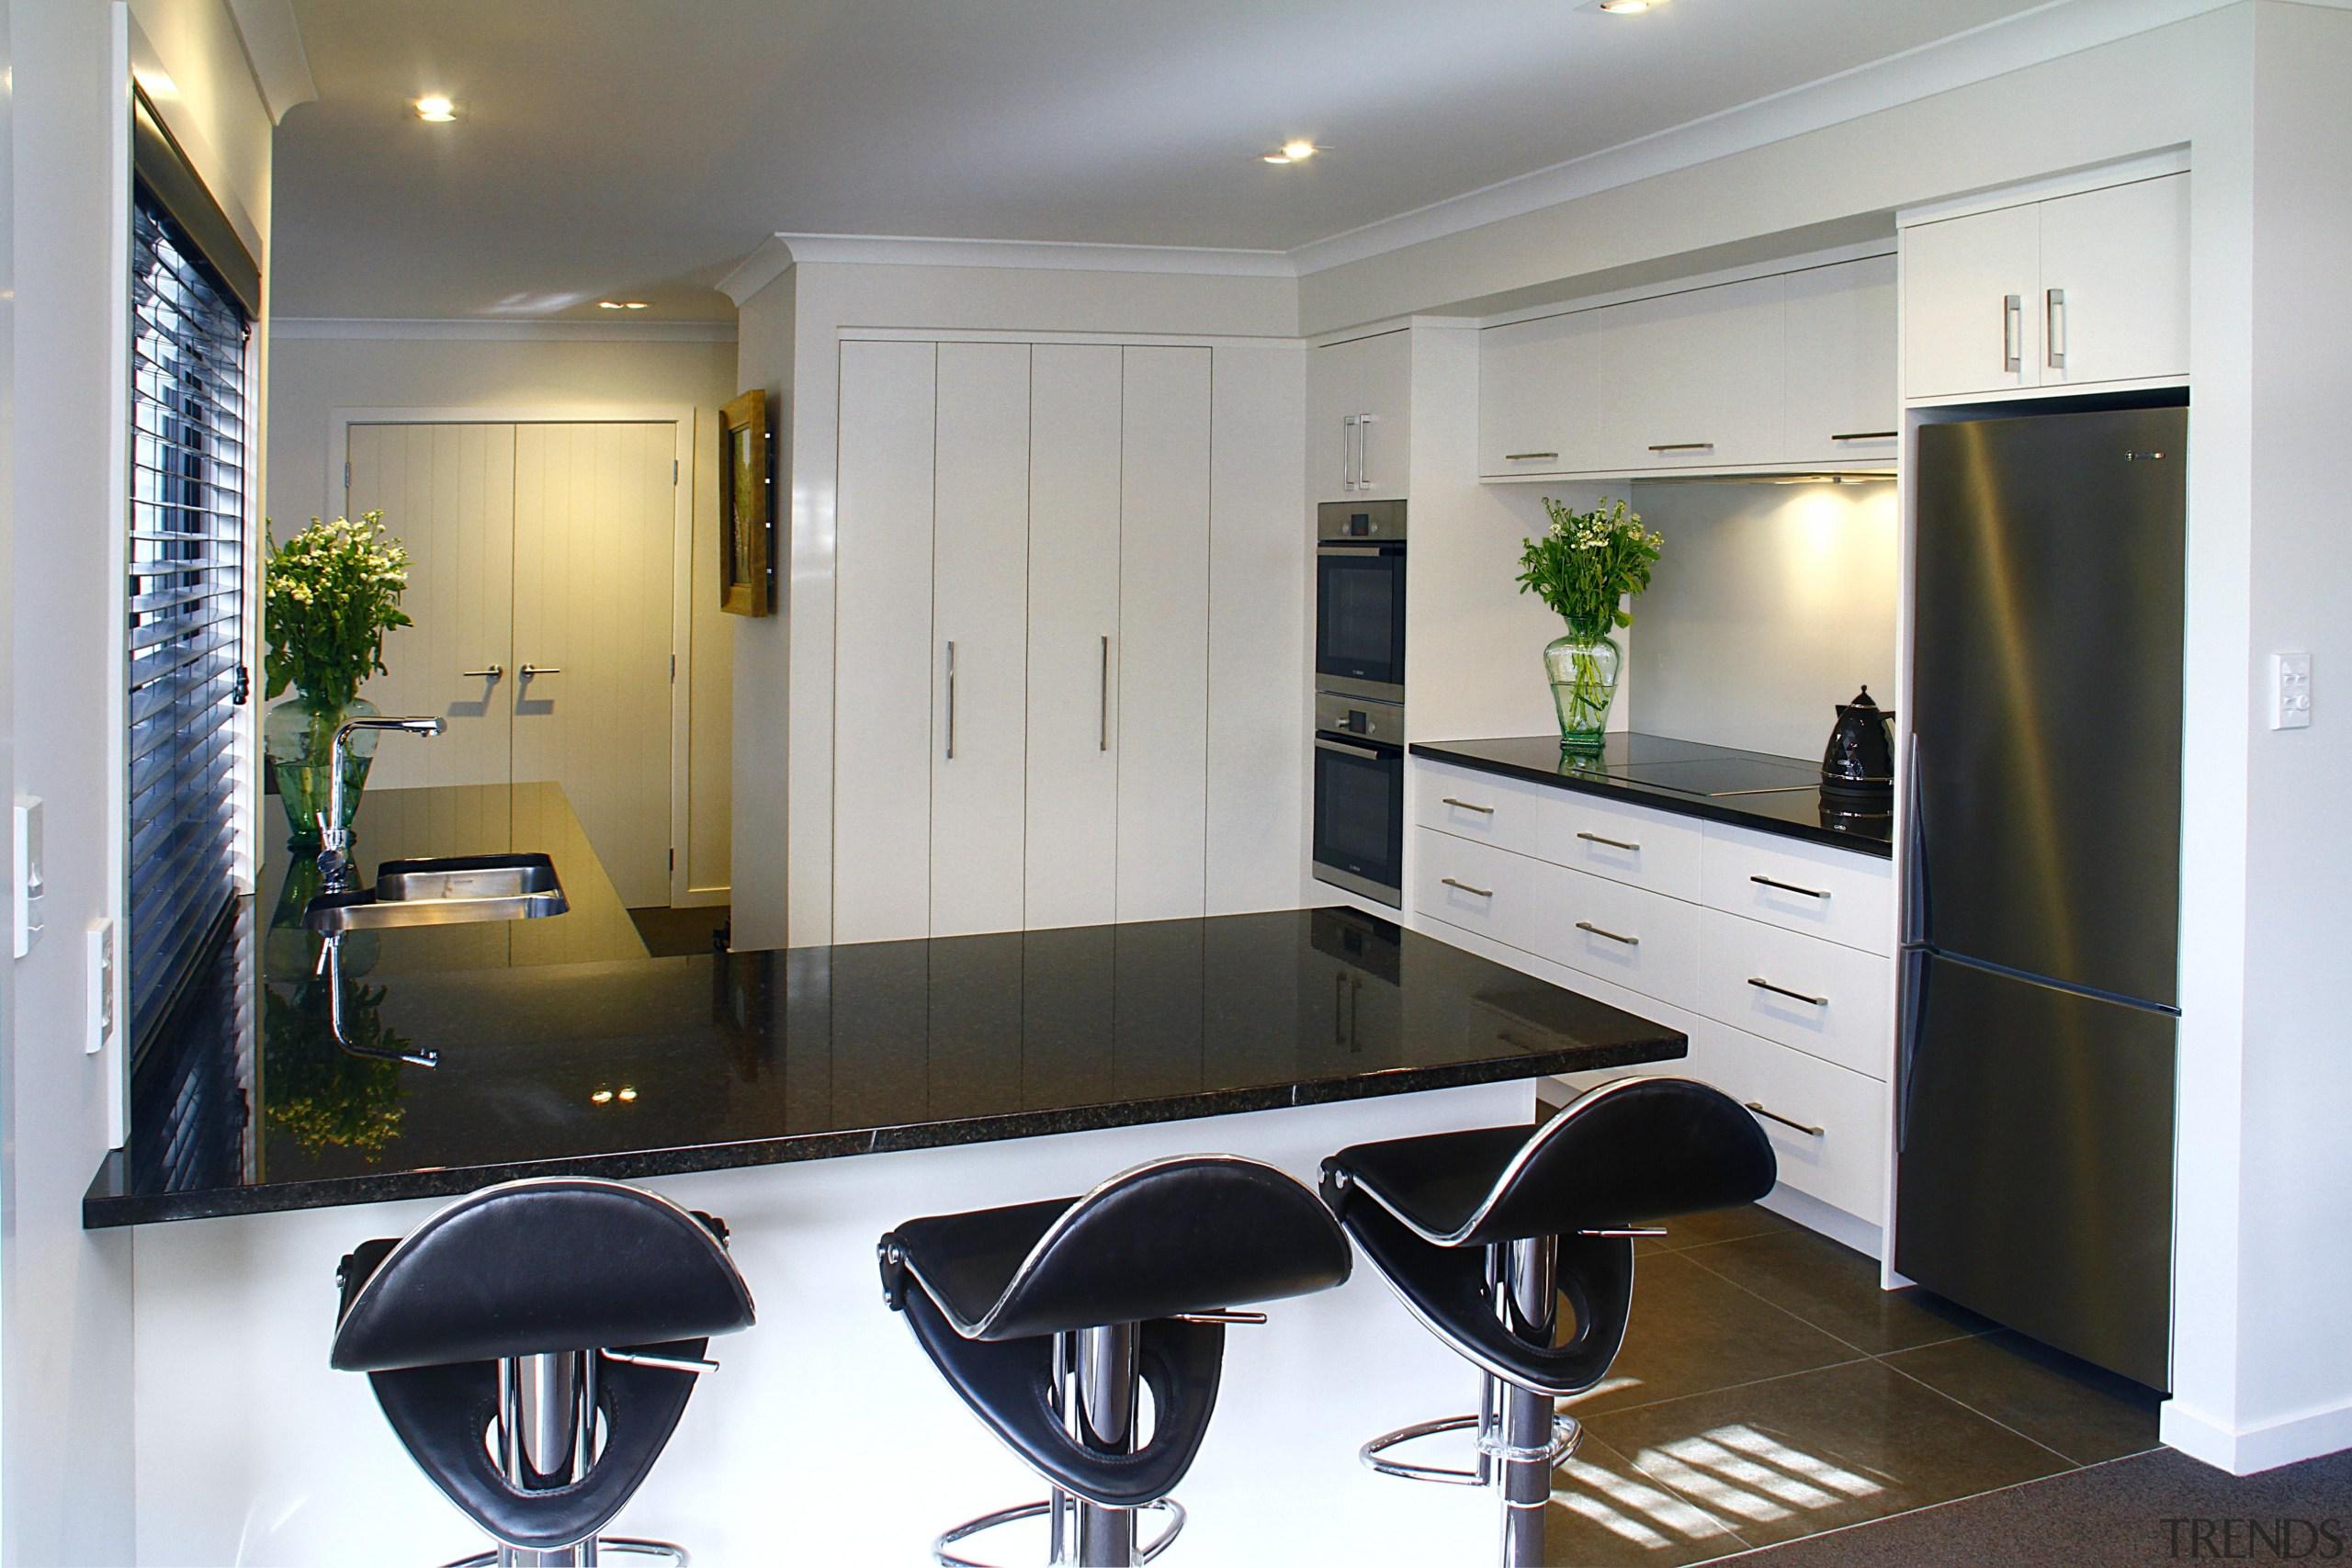 Open kitchen - cabinetry | interior design | cabinetry, interior design, kitchen, product design, real estate, room, gray, white